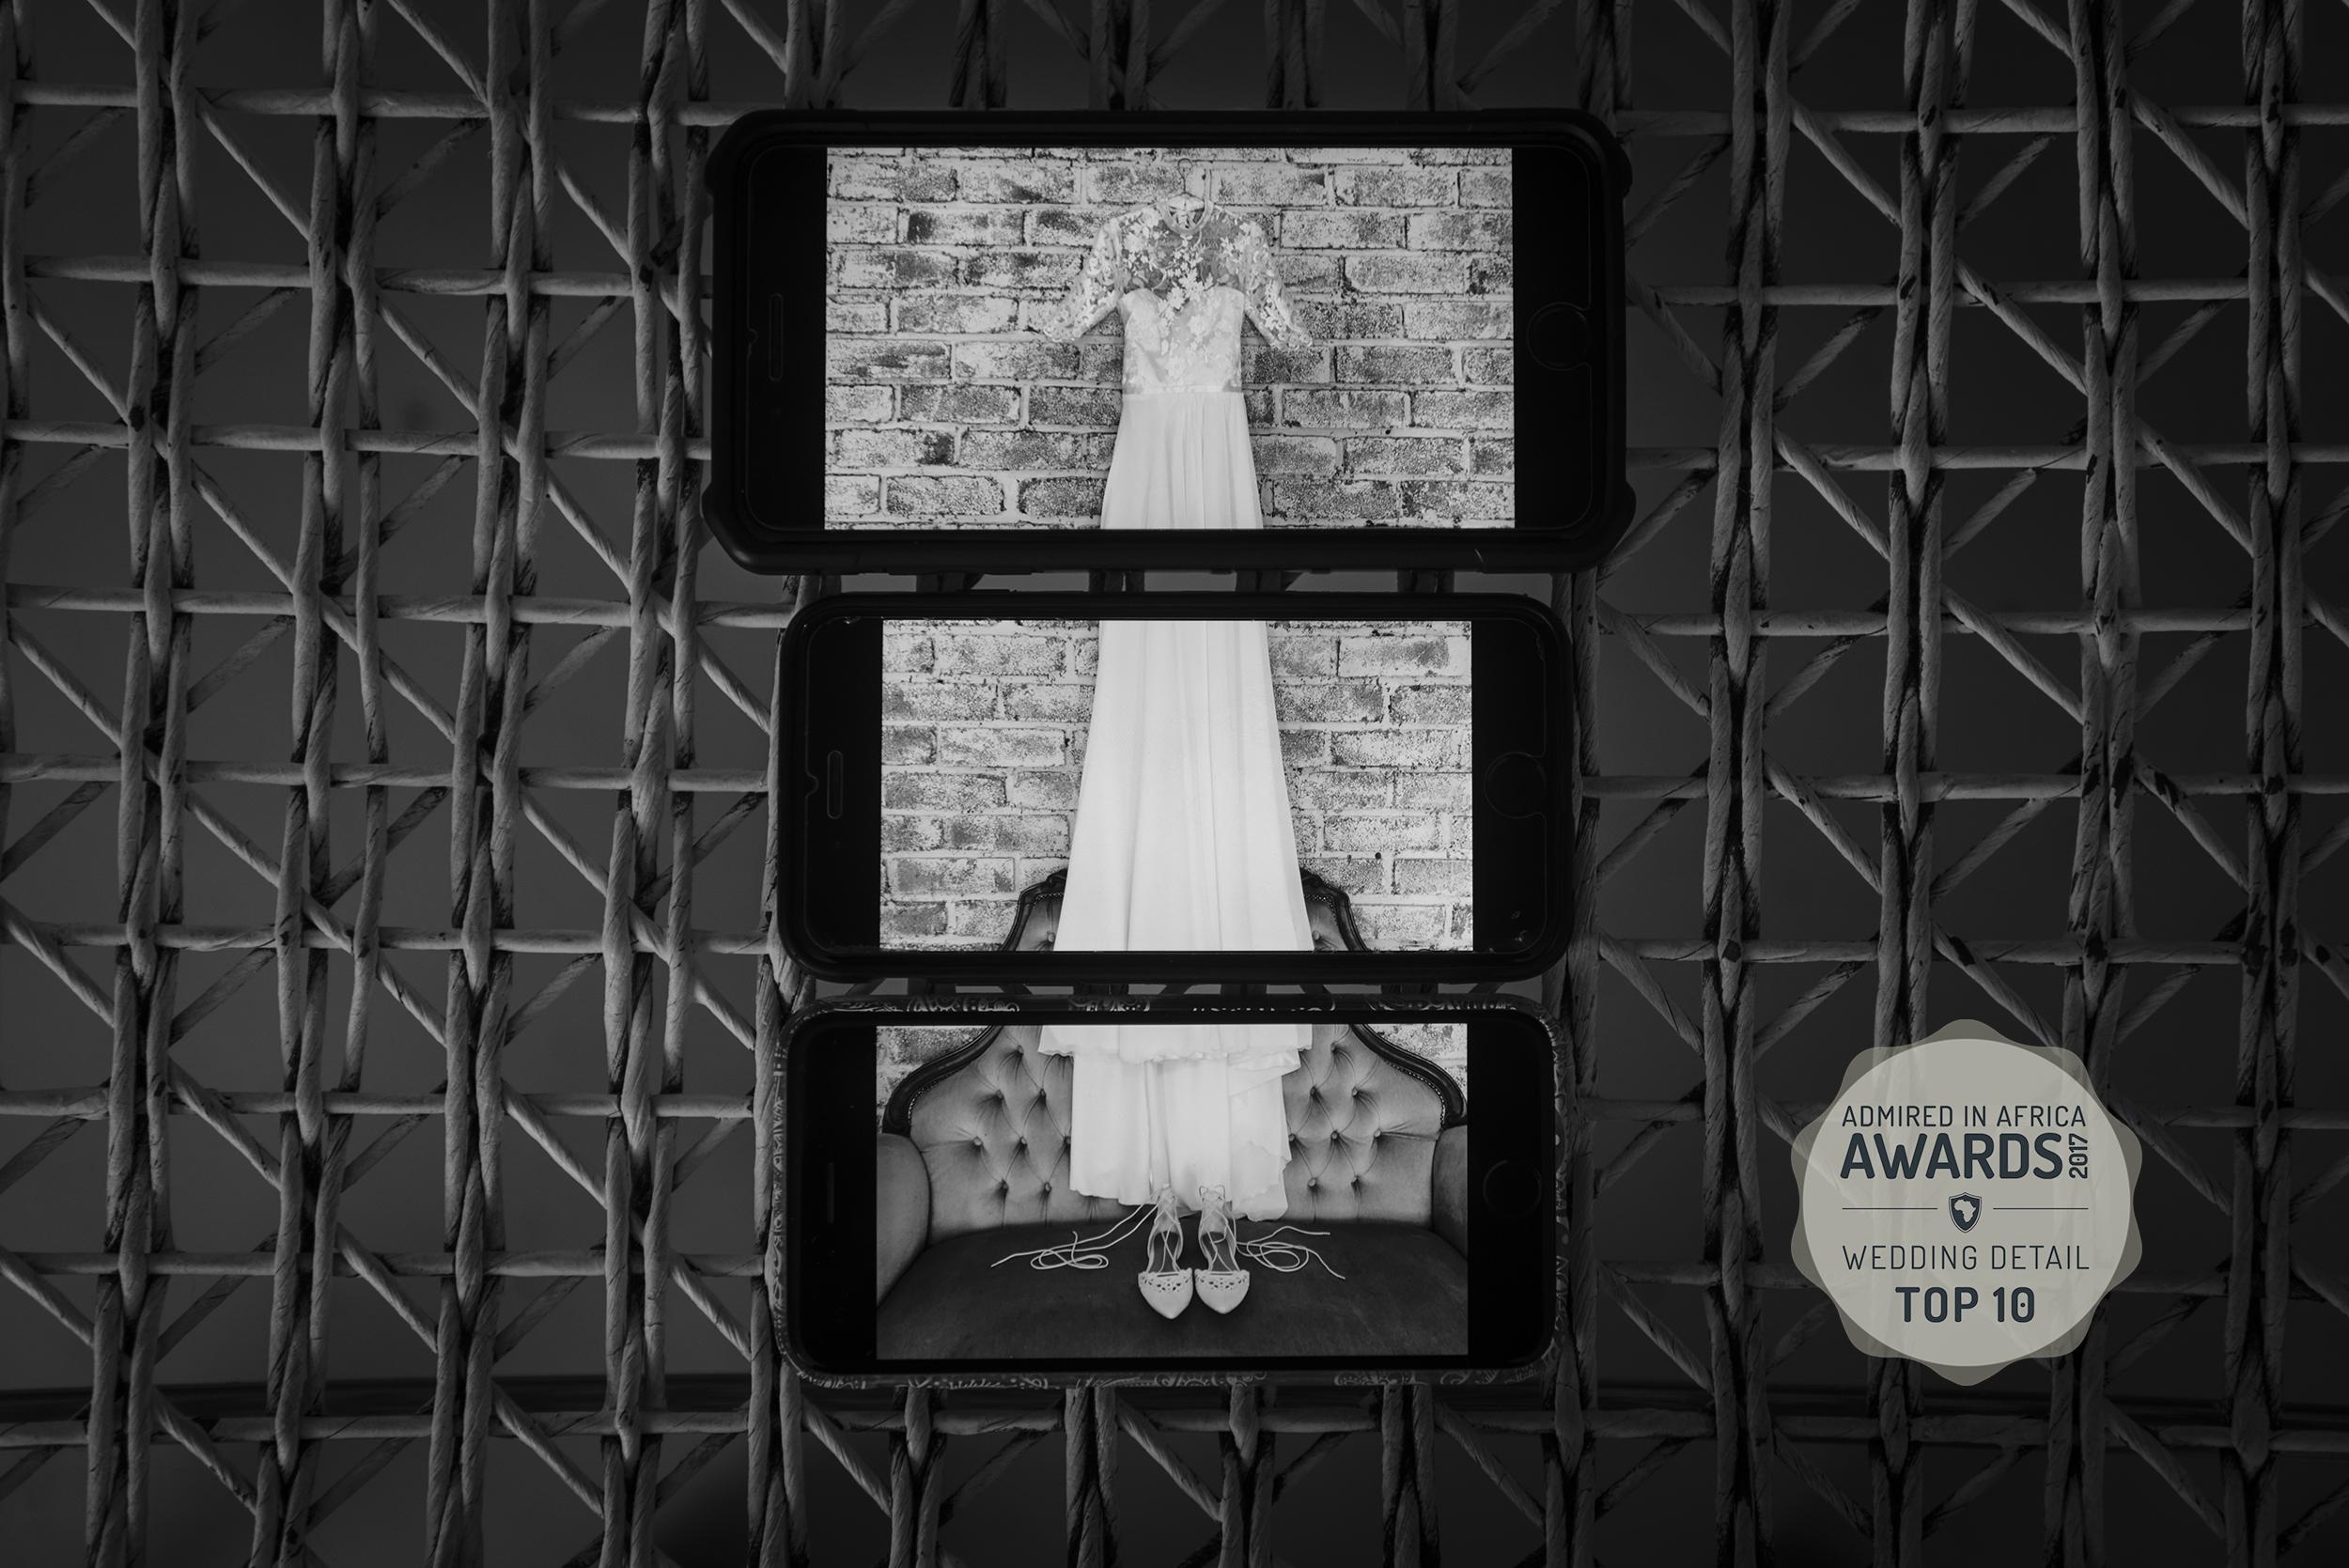 2017. Wedding Details Top 10. Admired In Africa